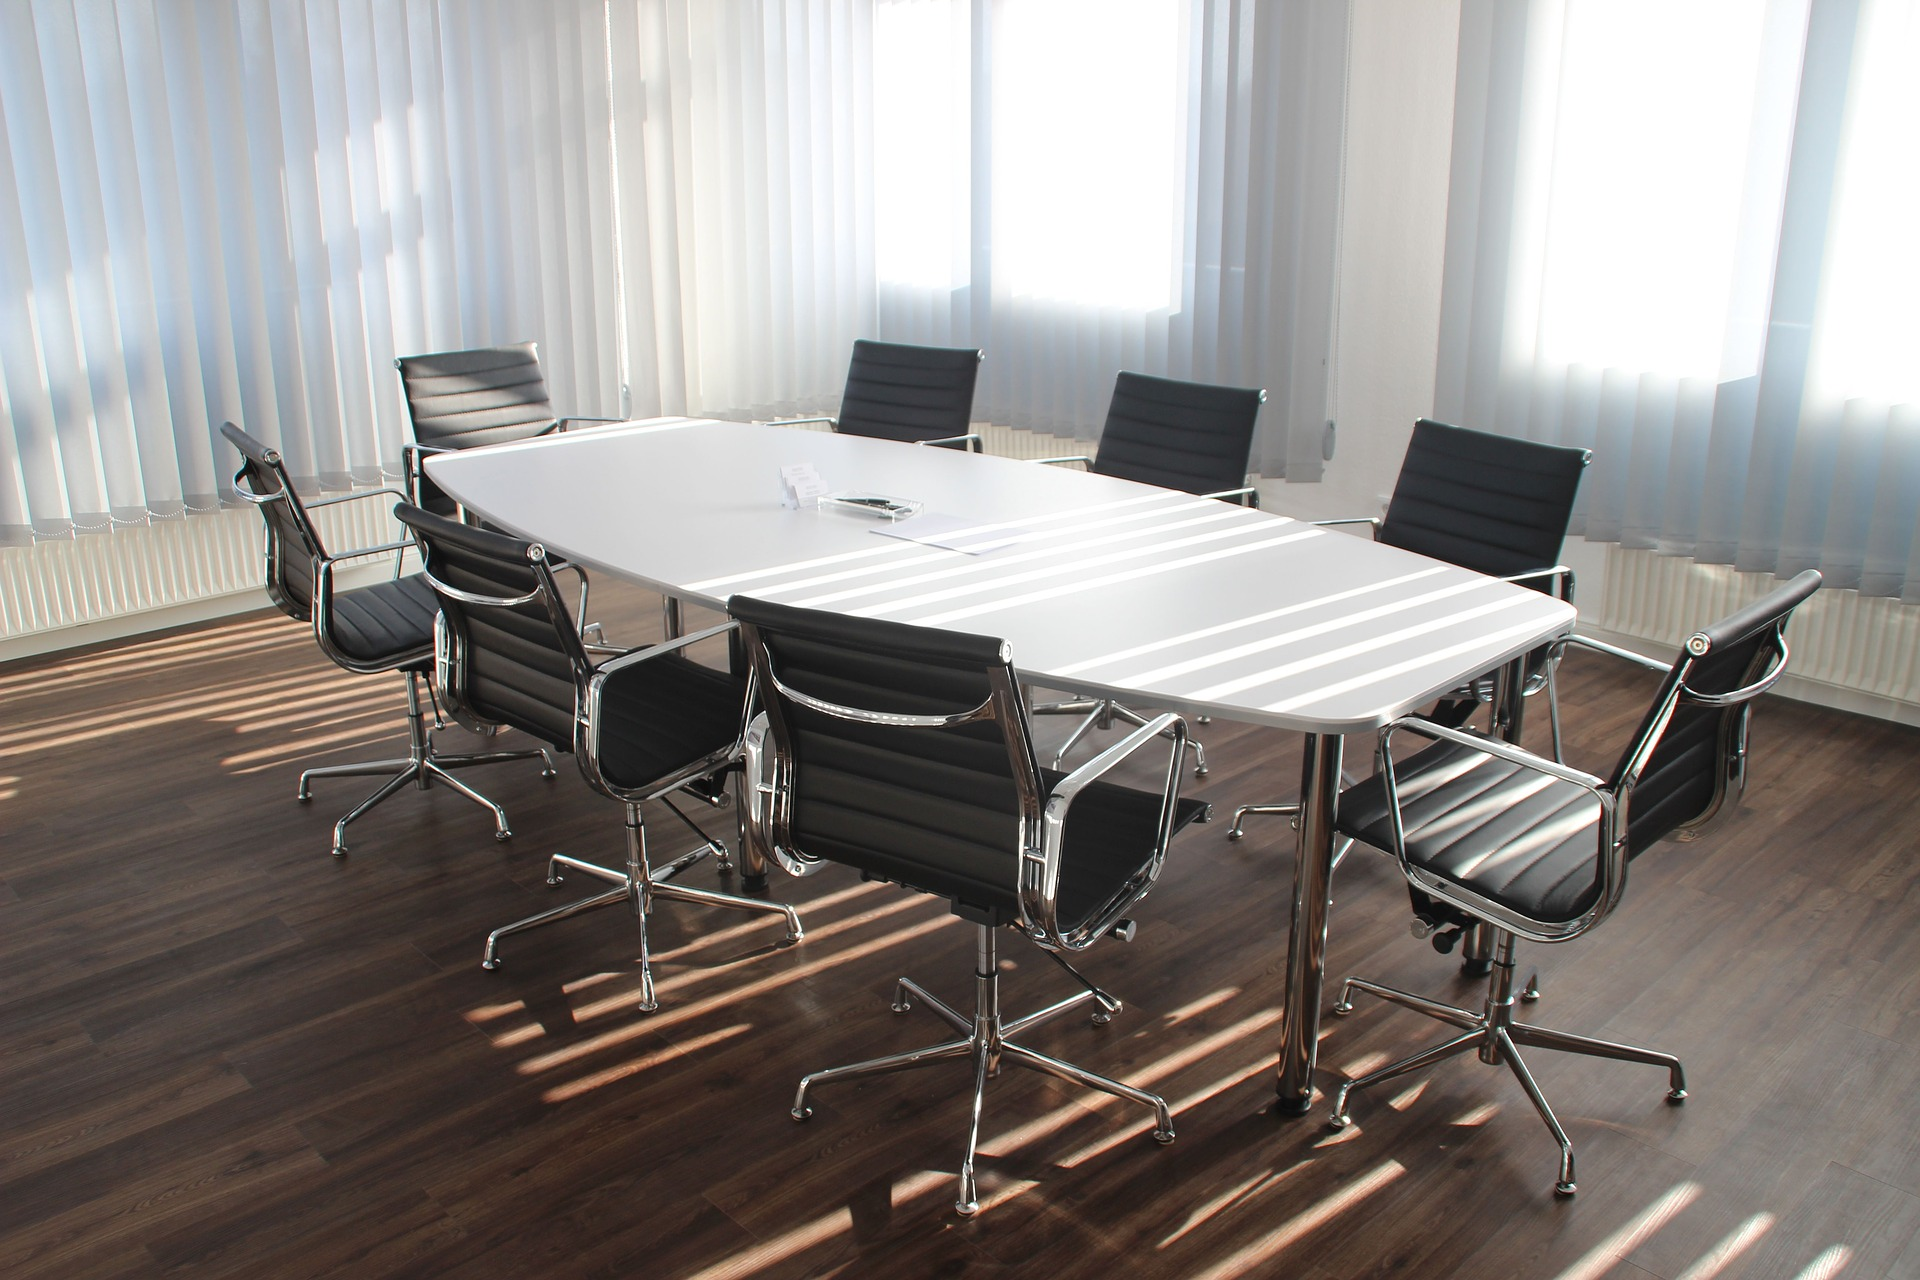 table-2254656_1920.jpg